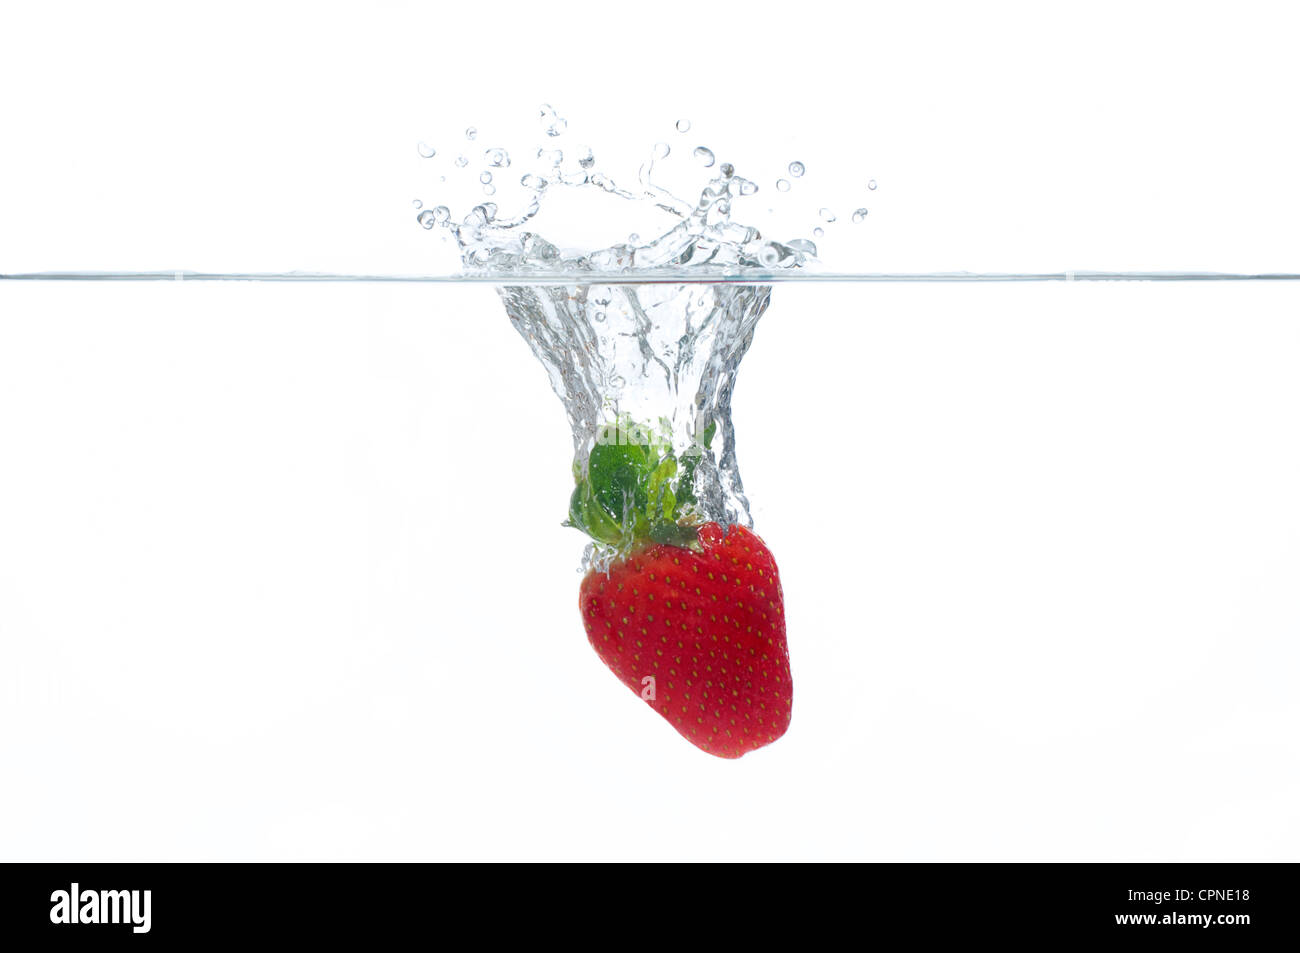 Strawberry splashing into water - Stock Image